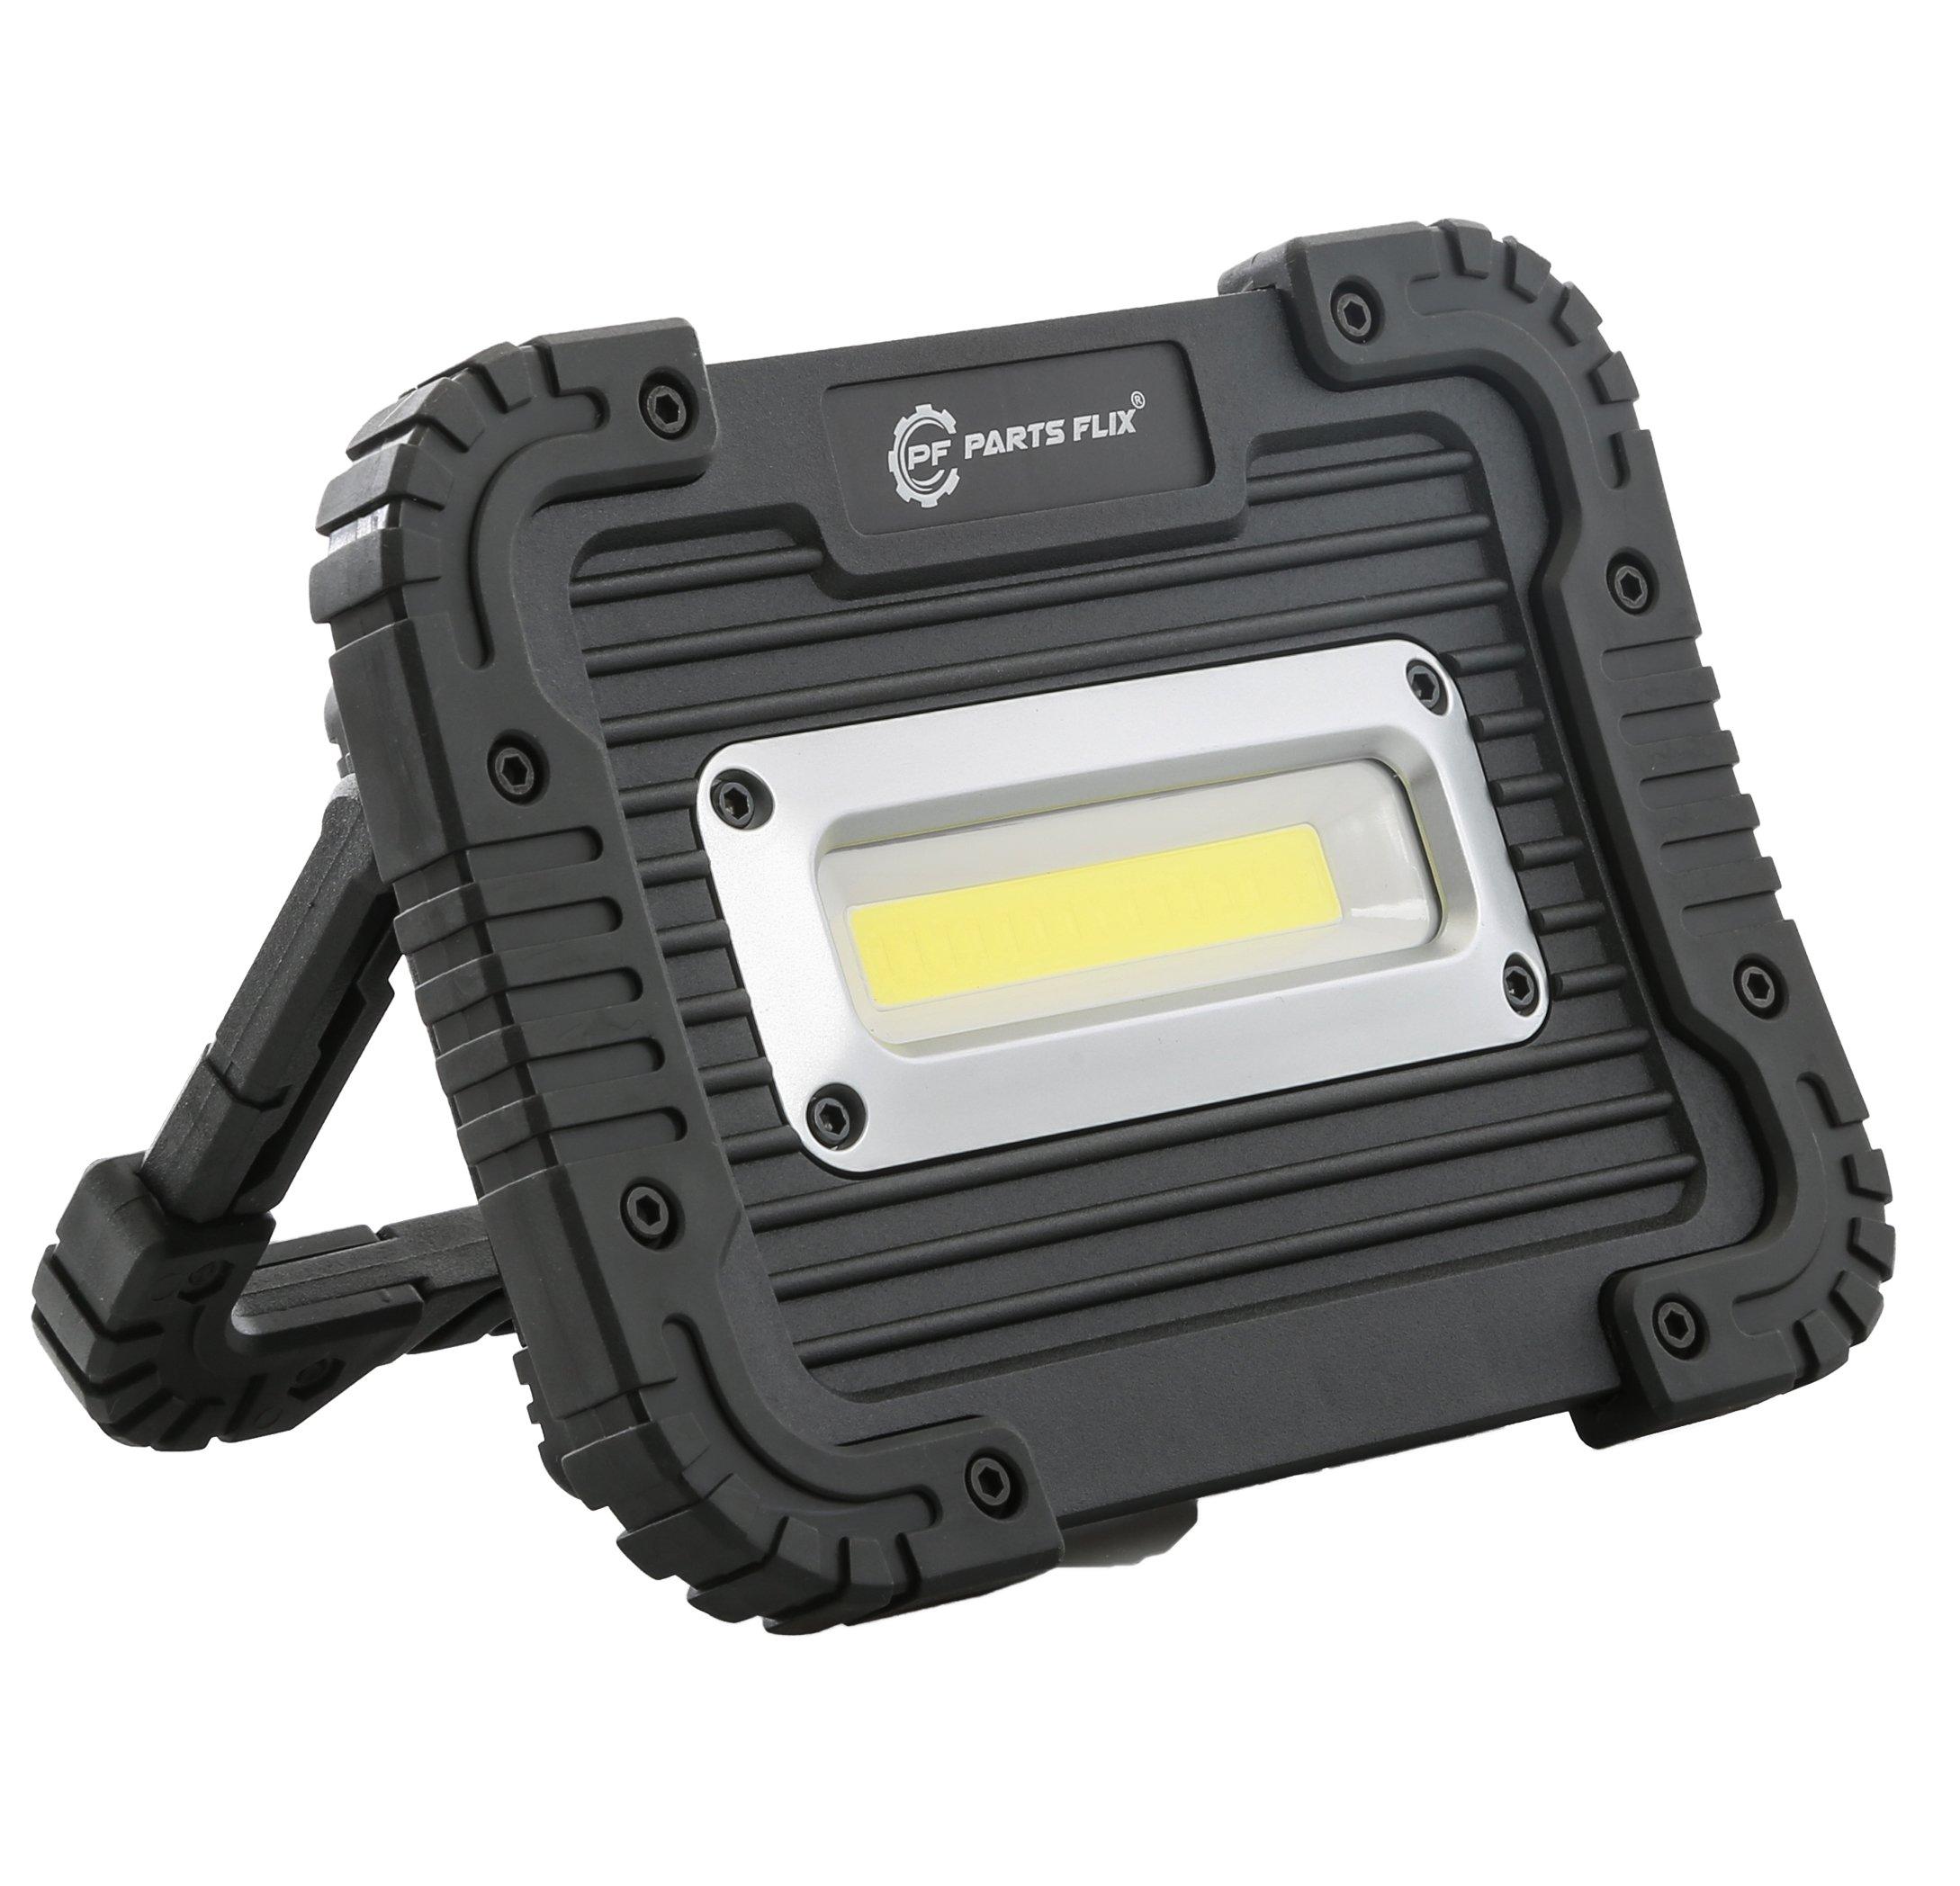 Parts Flix Ultra Bright Spotlight Rechargeable Portable LED Work Light,Outdoor Waterproof Flood Lights (PF-W5112-B)